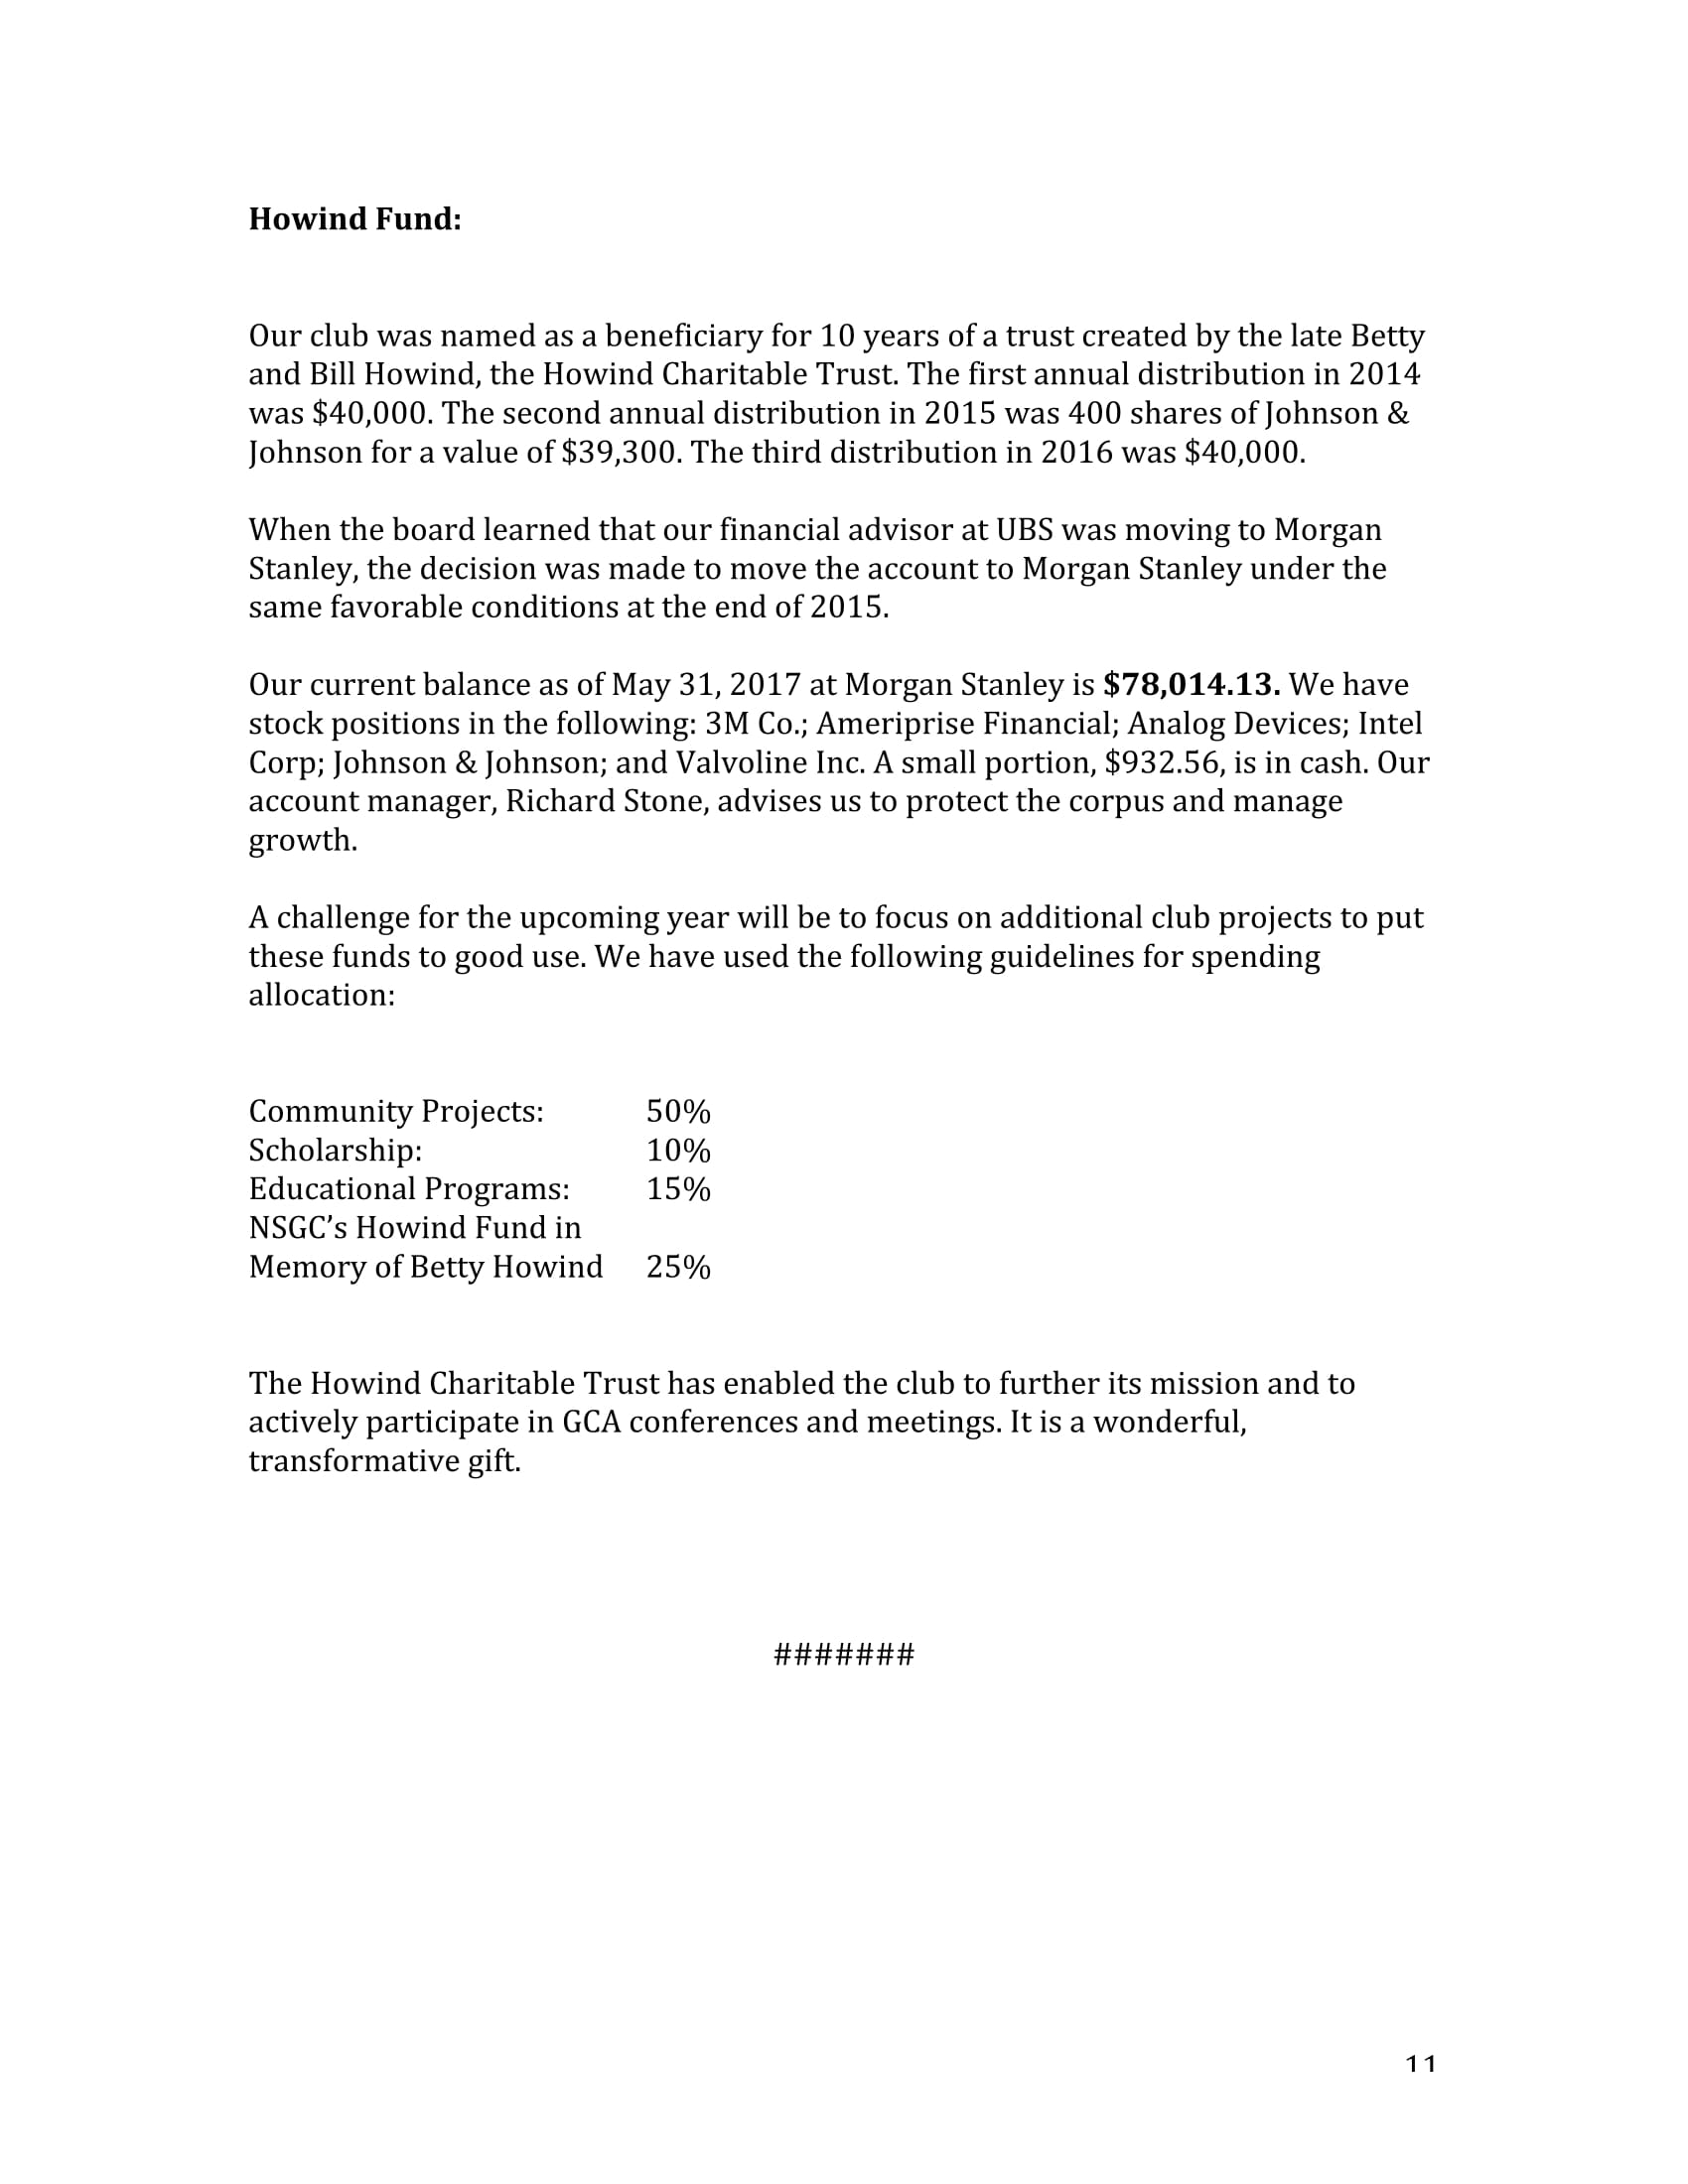 NSGC Annual Report-11.jpg